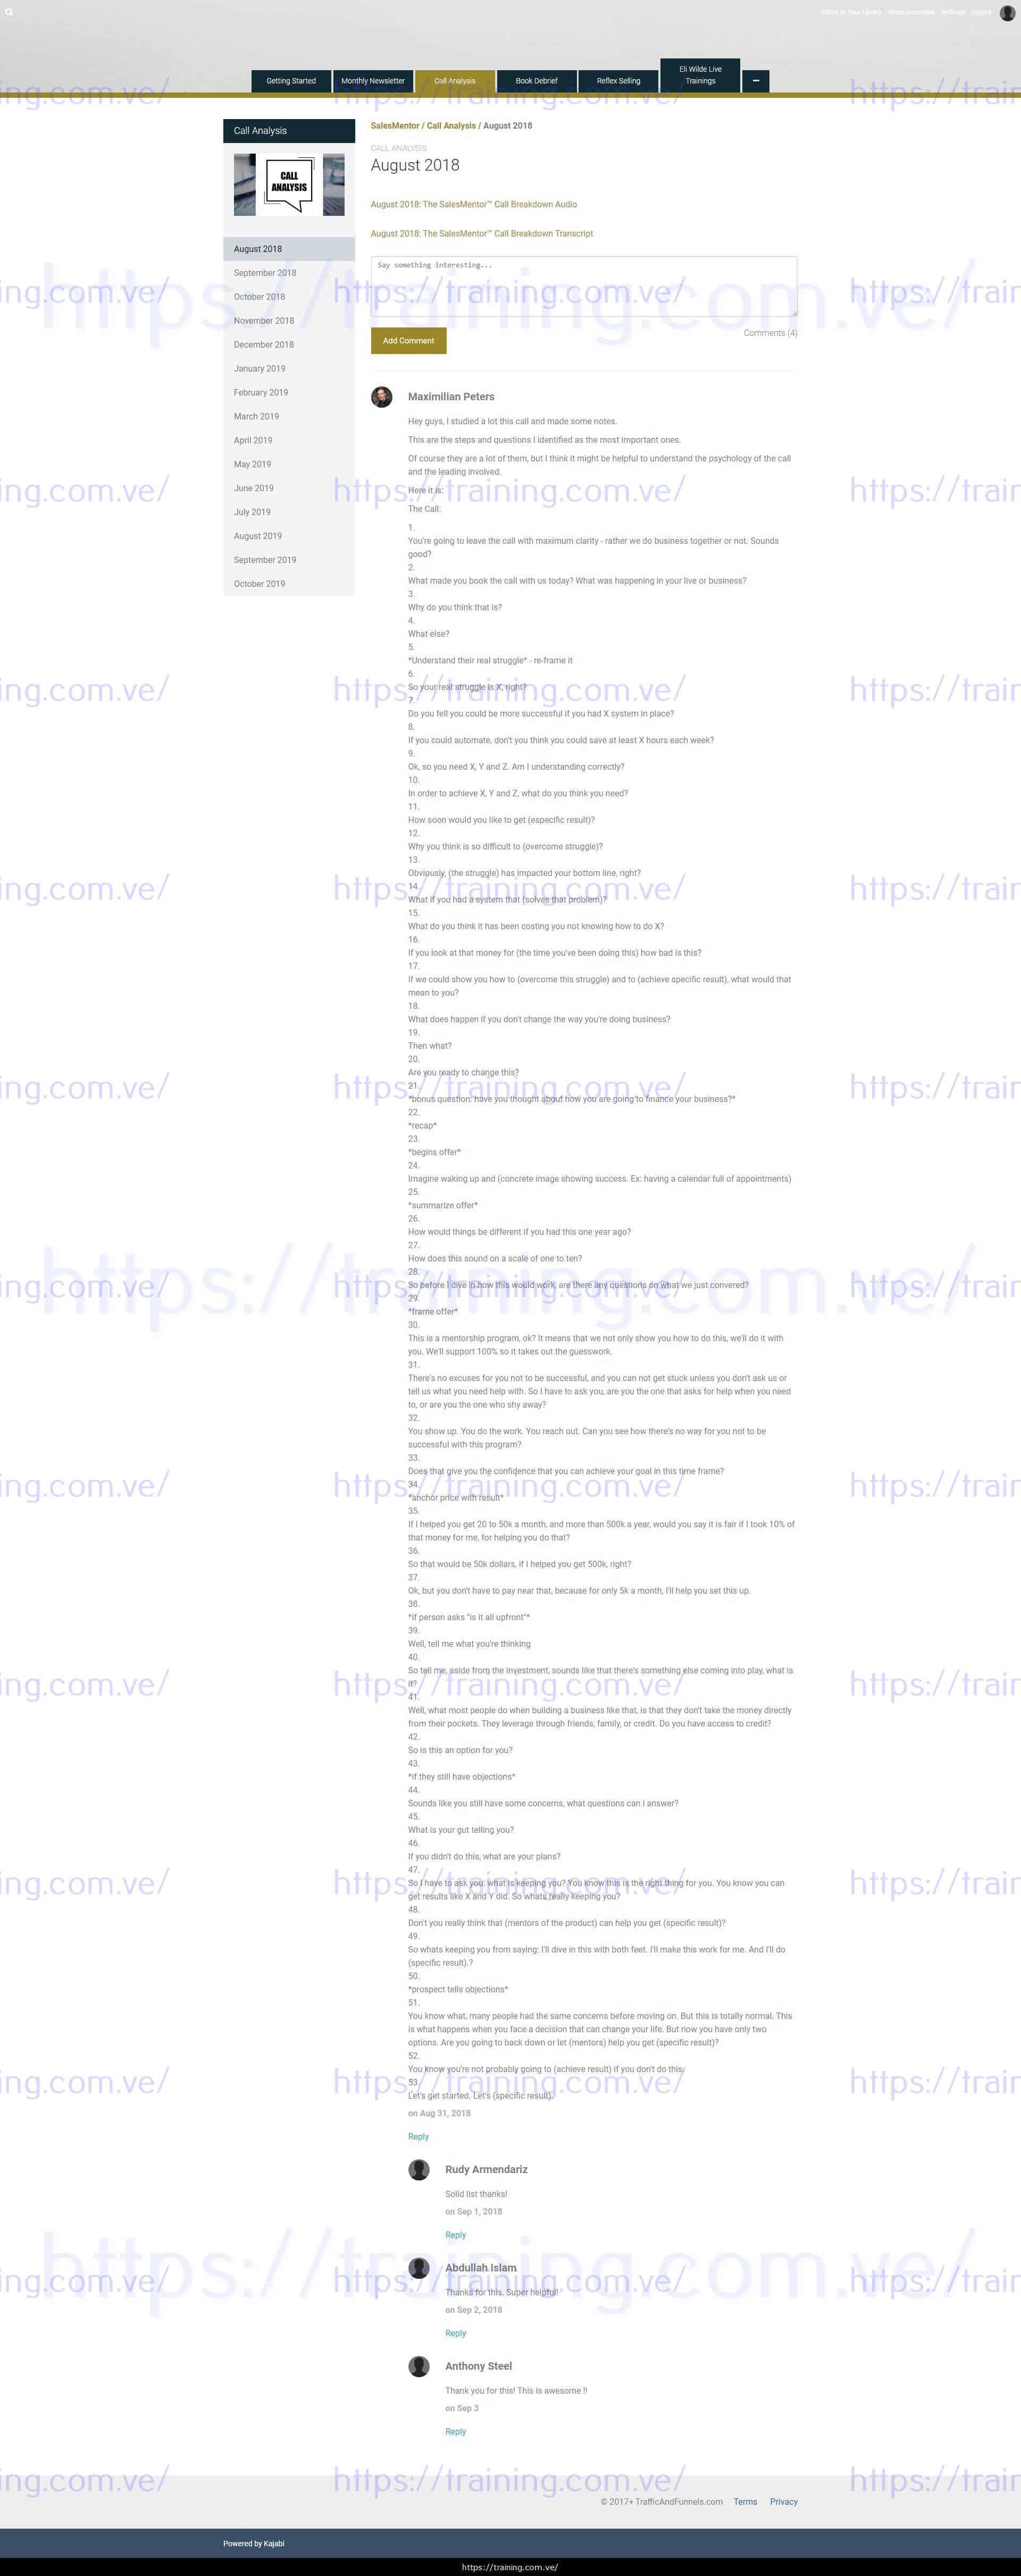 SalesMentor by Traffic & Funnels Download